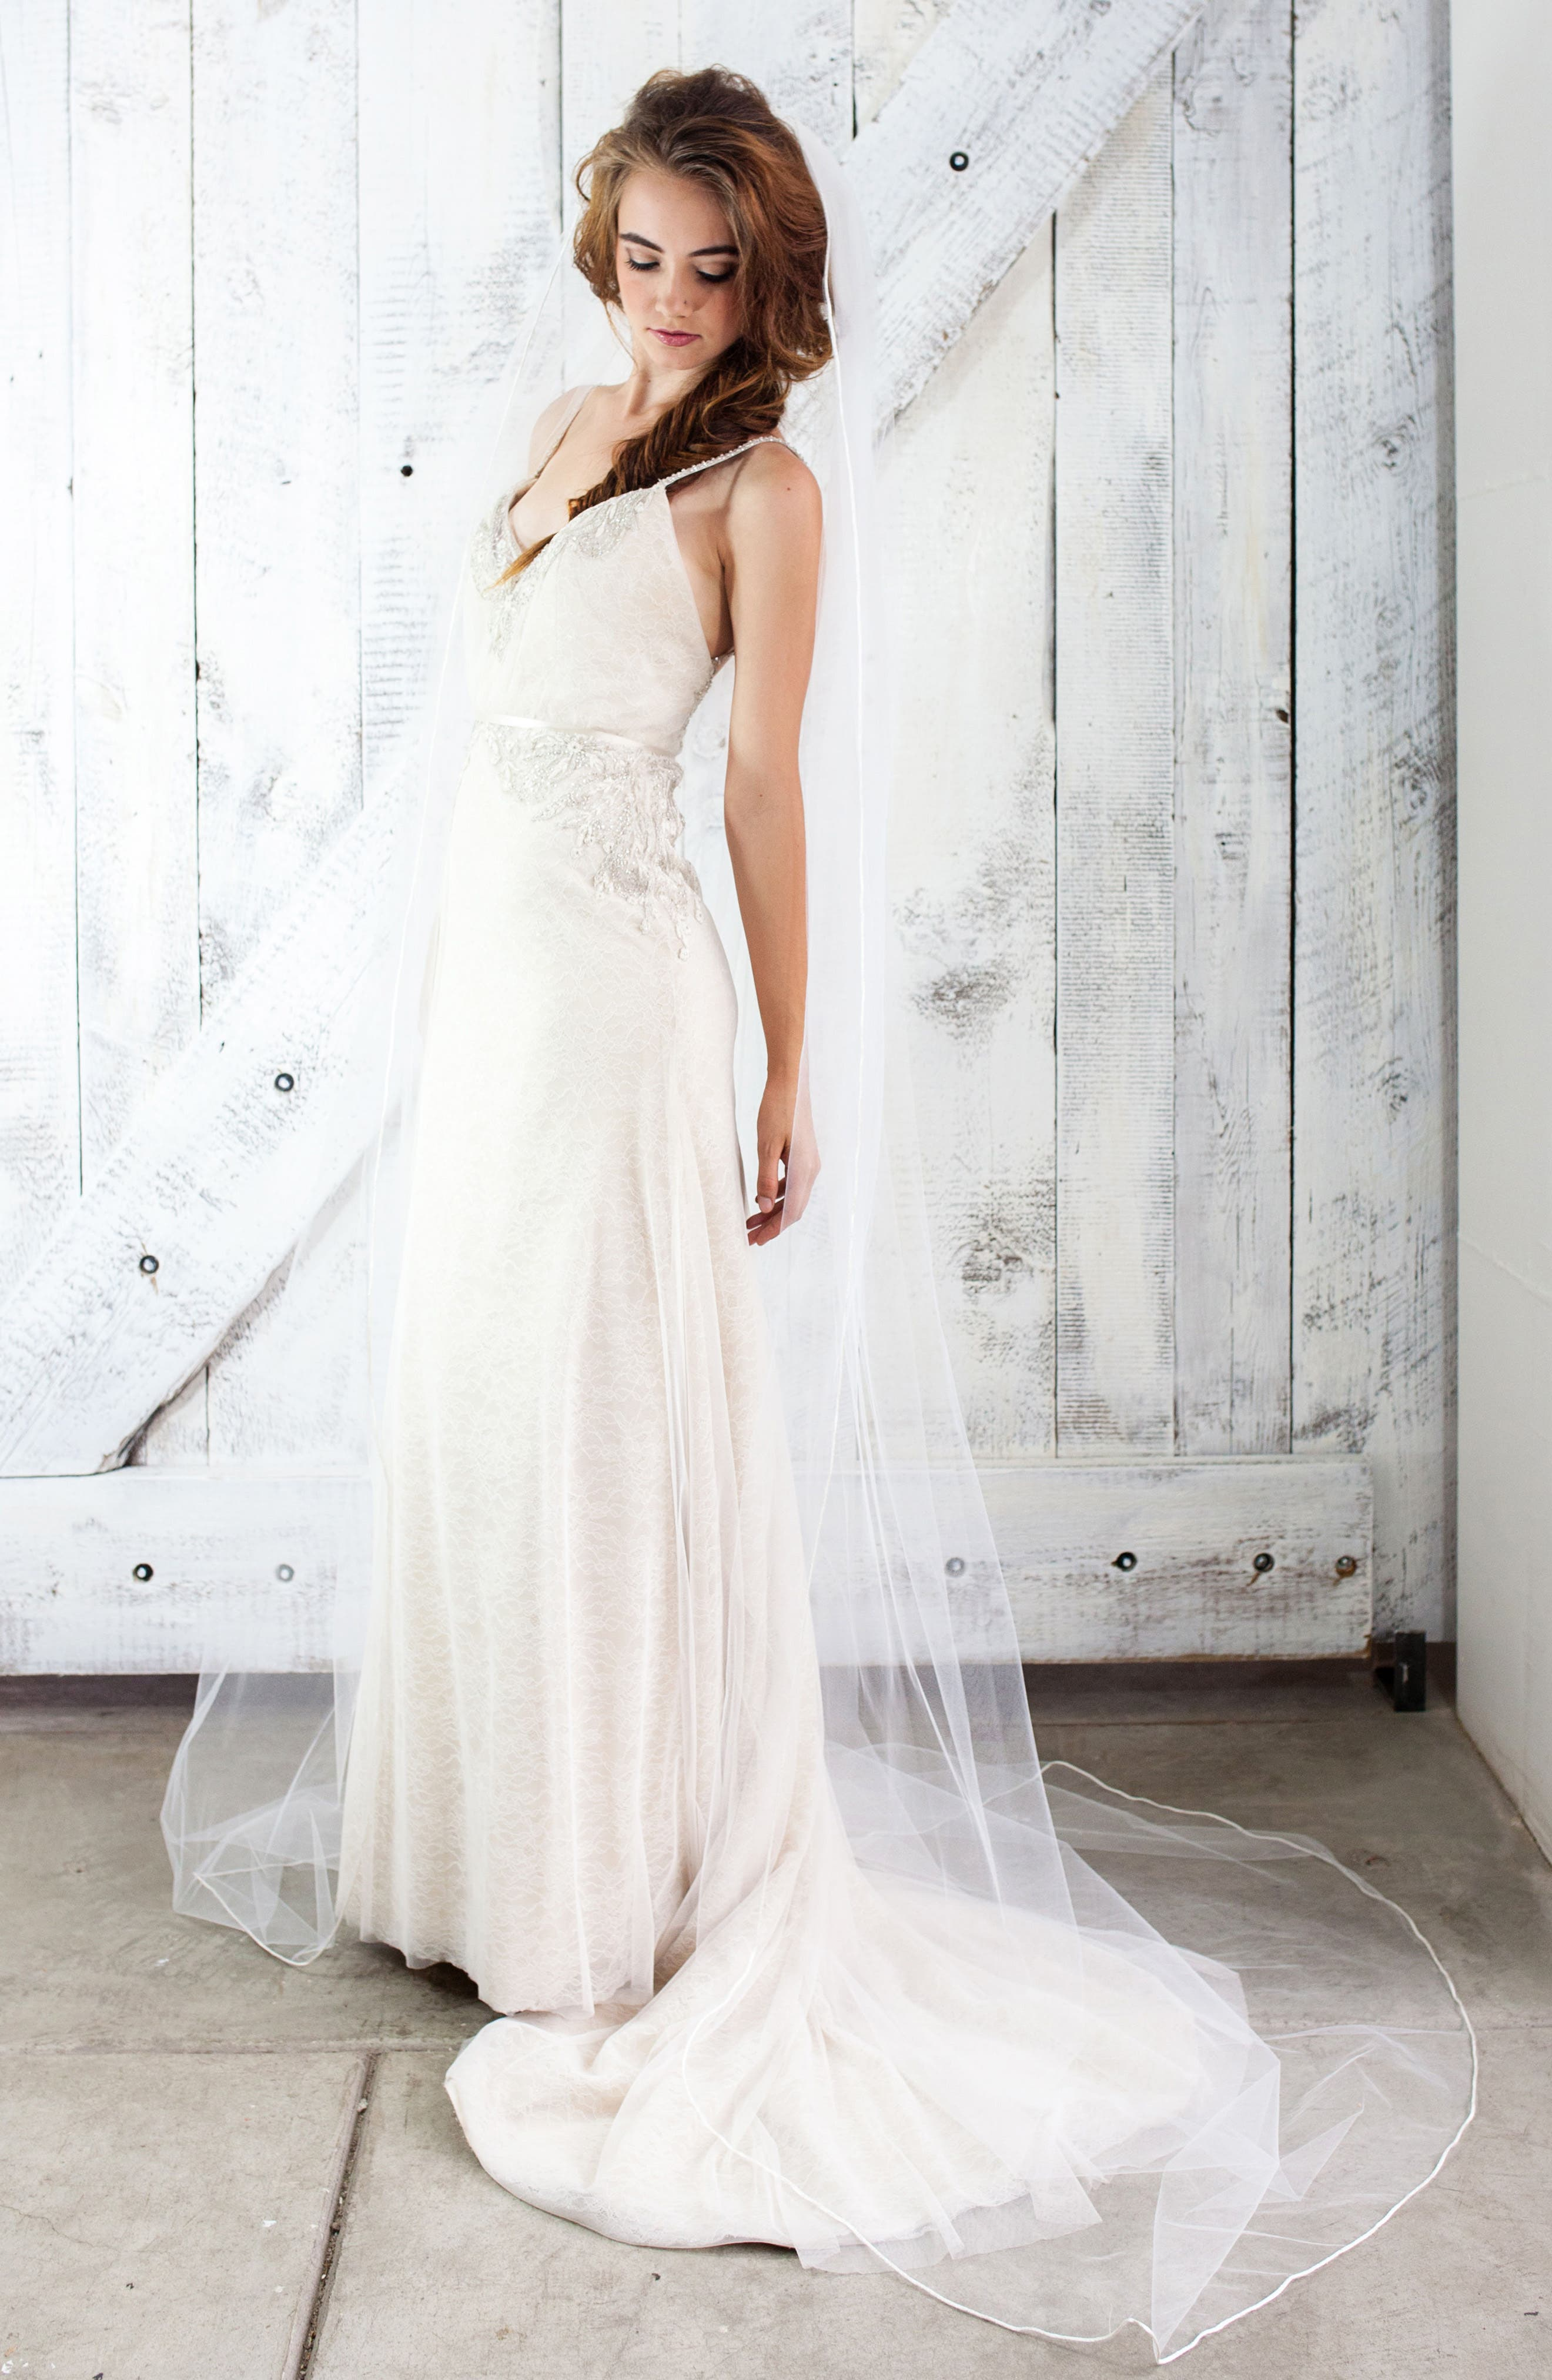 Kauai Mesh Bridal Veil,                         Main,                         color, Light Ivory